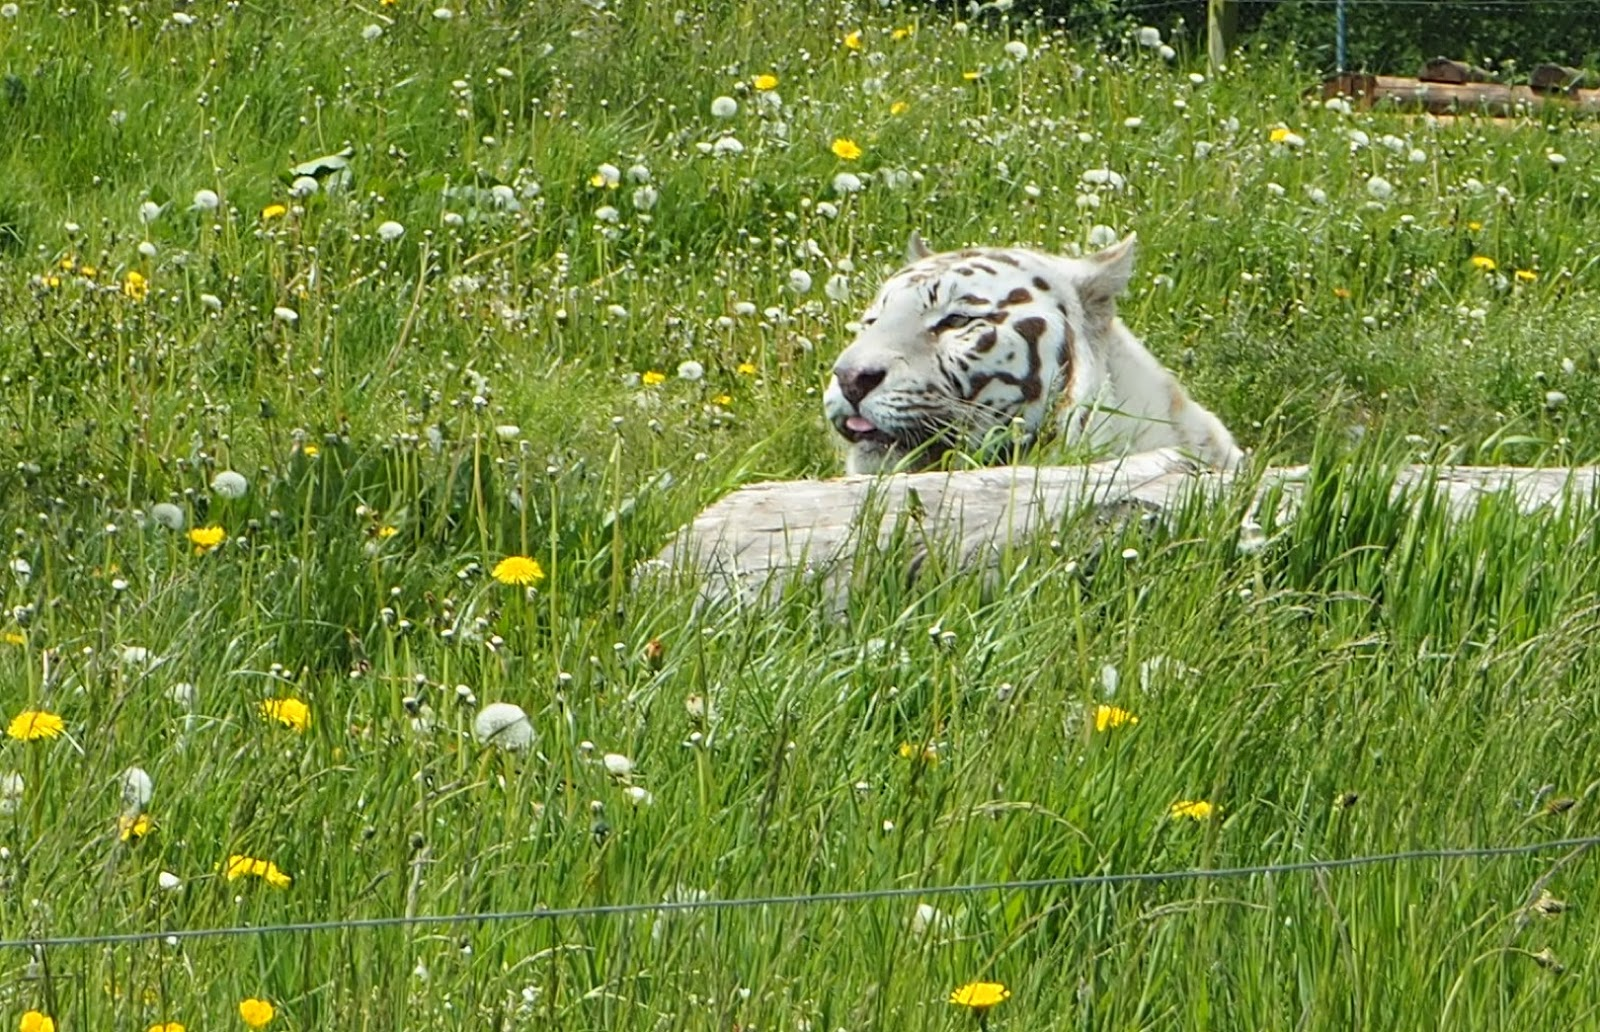 west midland safari park white tiger